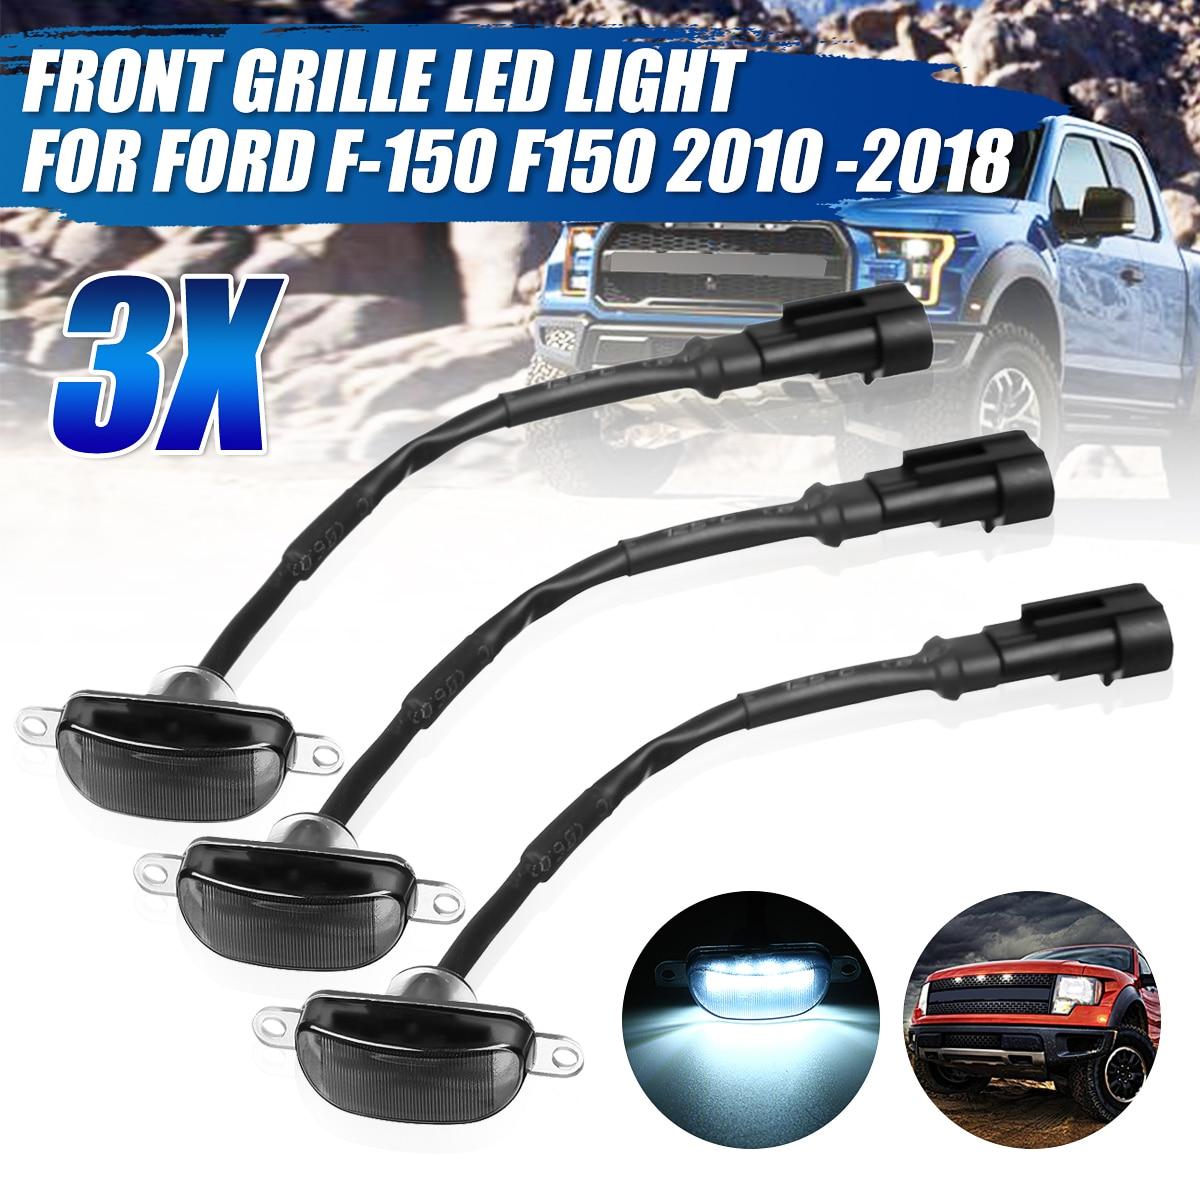 3 uds coche LED parrilla luz Raptor estilo Parrilla de humo para Ford F-150 F150 2010, 2011, 2012, 2013, 2014, 2015, 2016, 2017, 2018